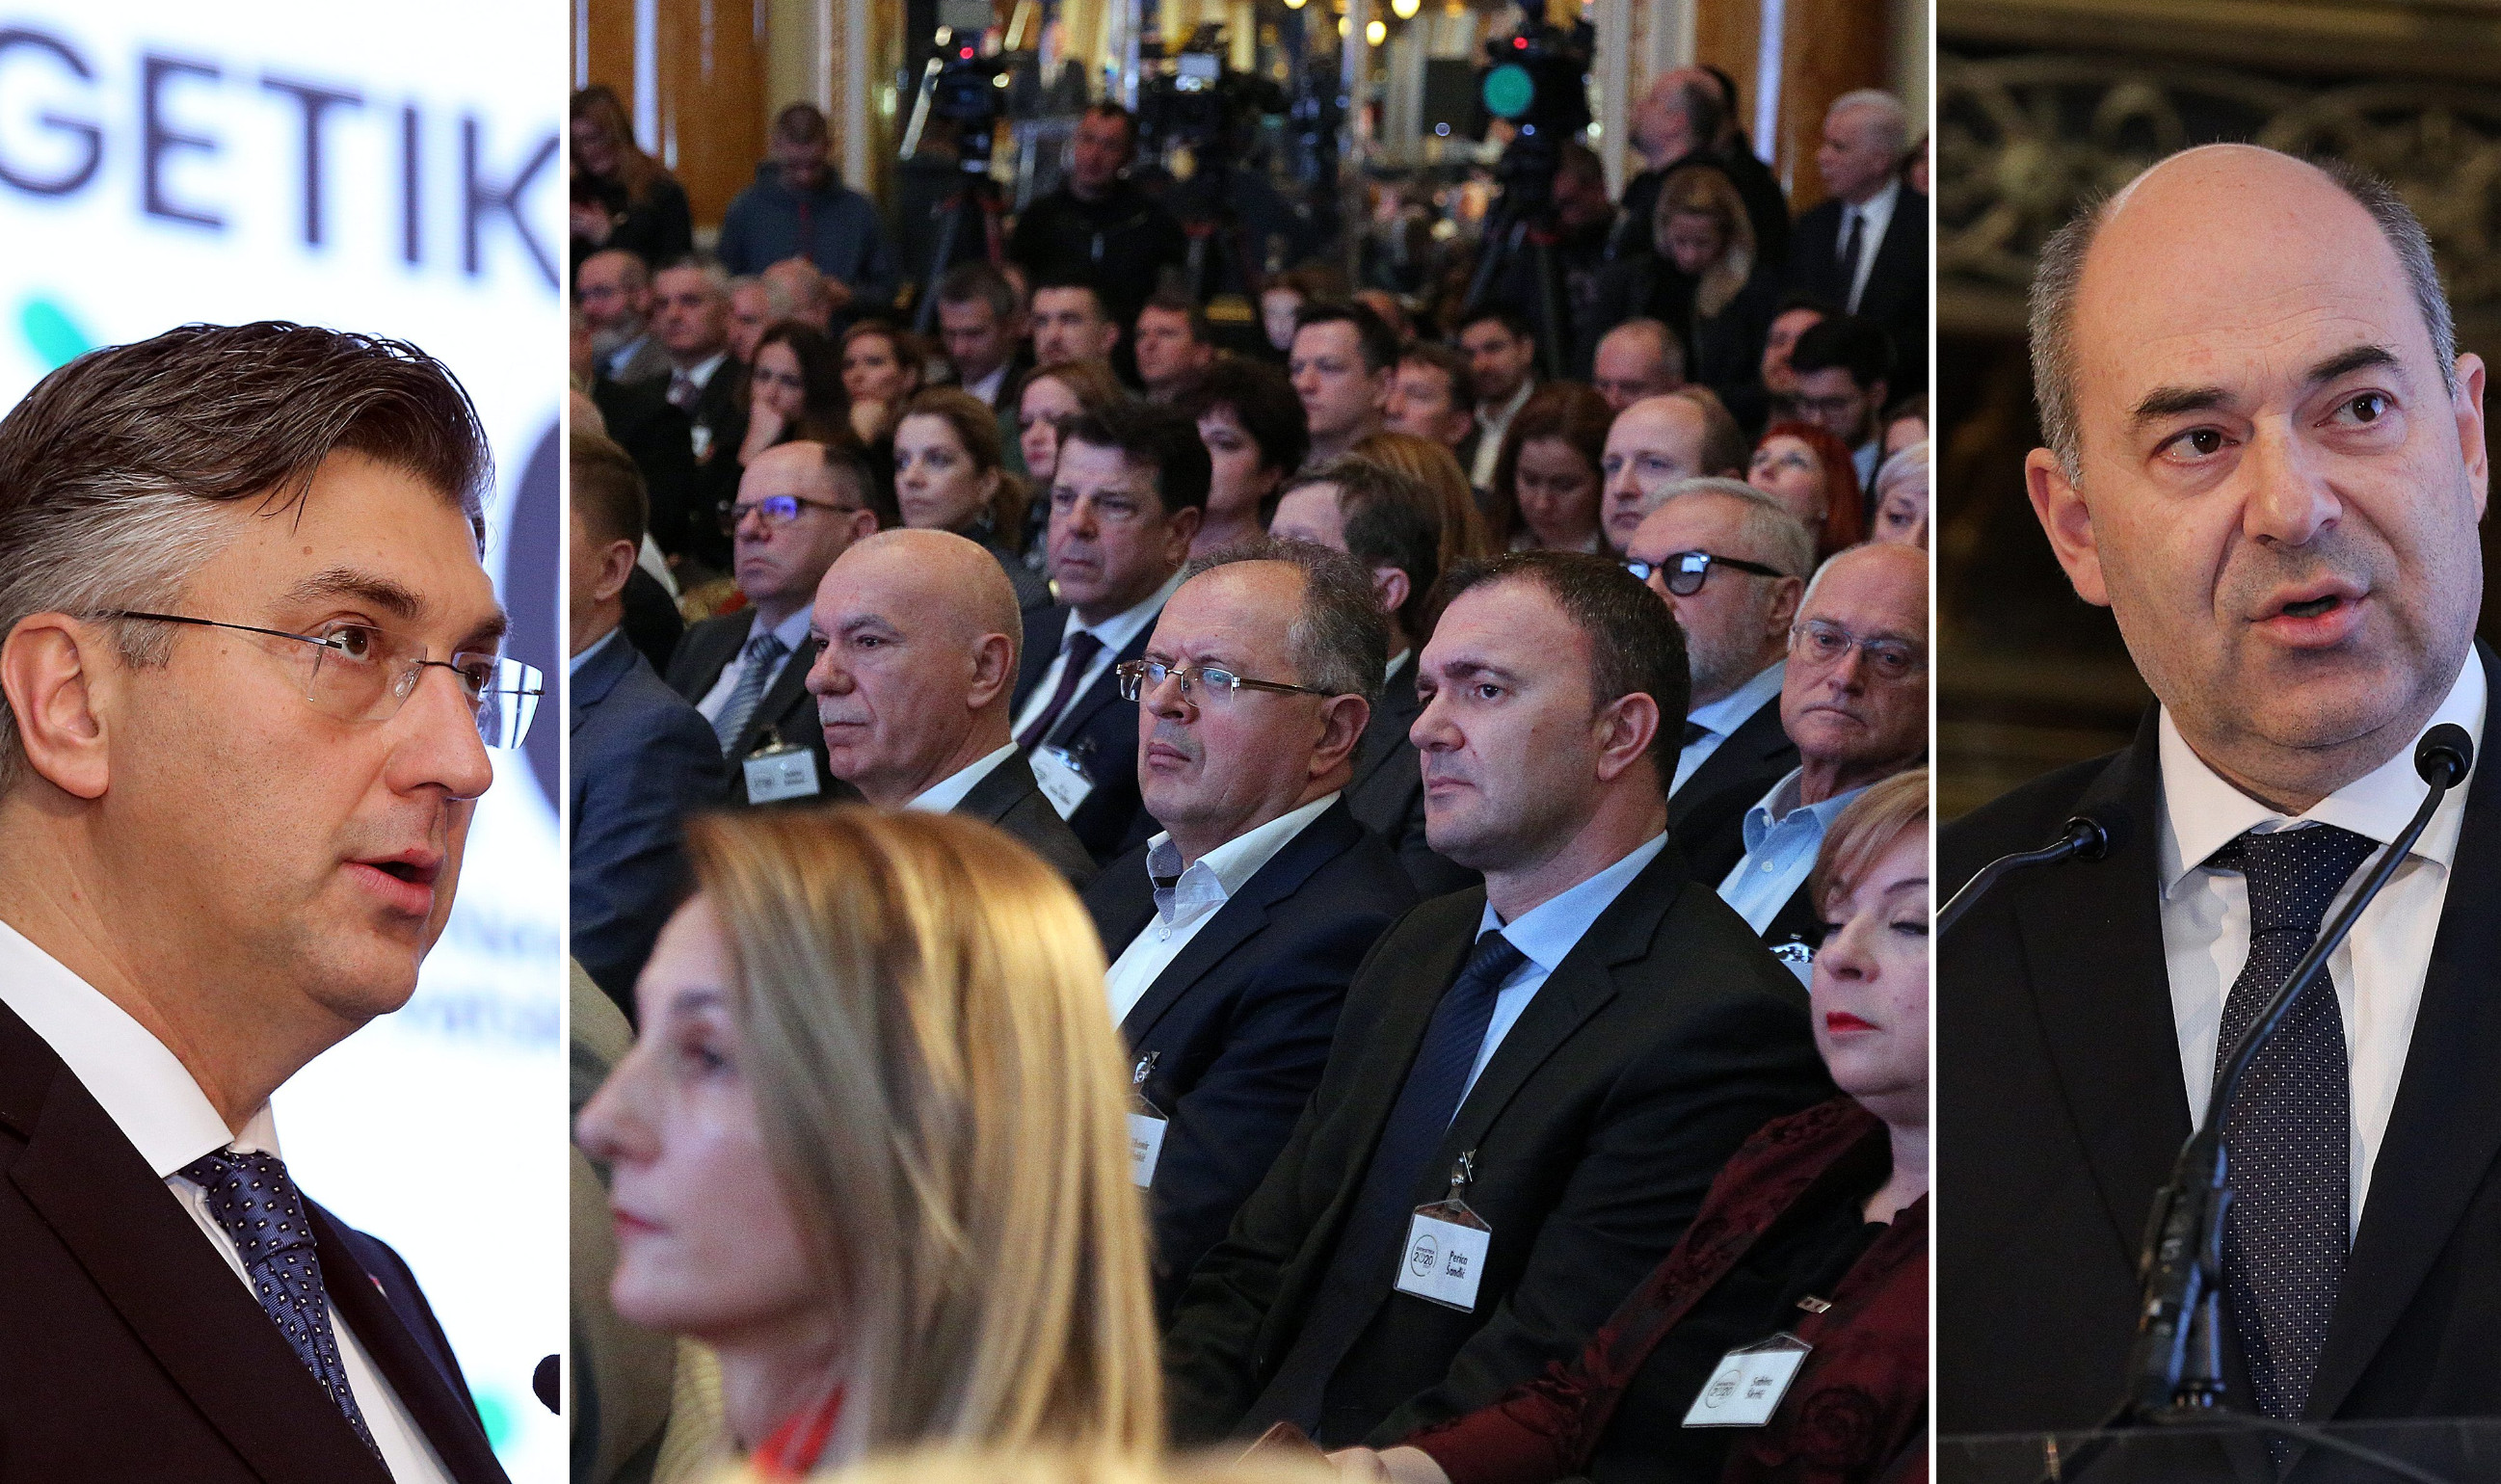 Konferencija Jutarnjeg lista Energetika 2020. 'Green New Deal za Hrvatsku'